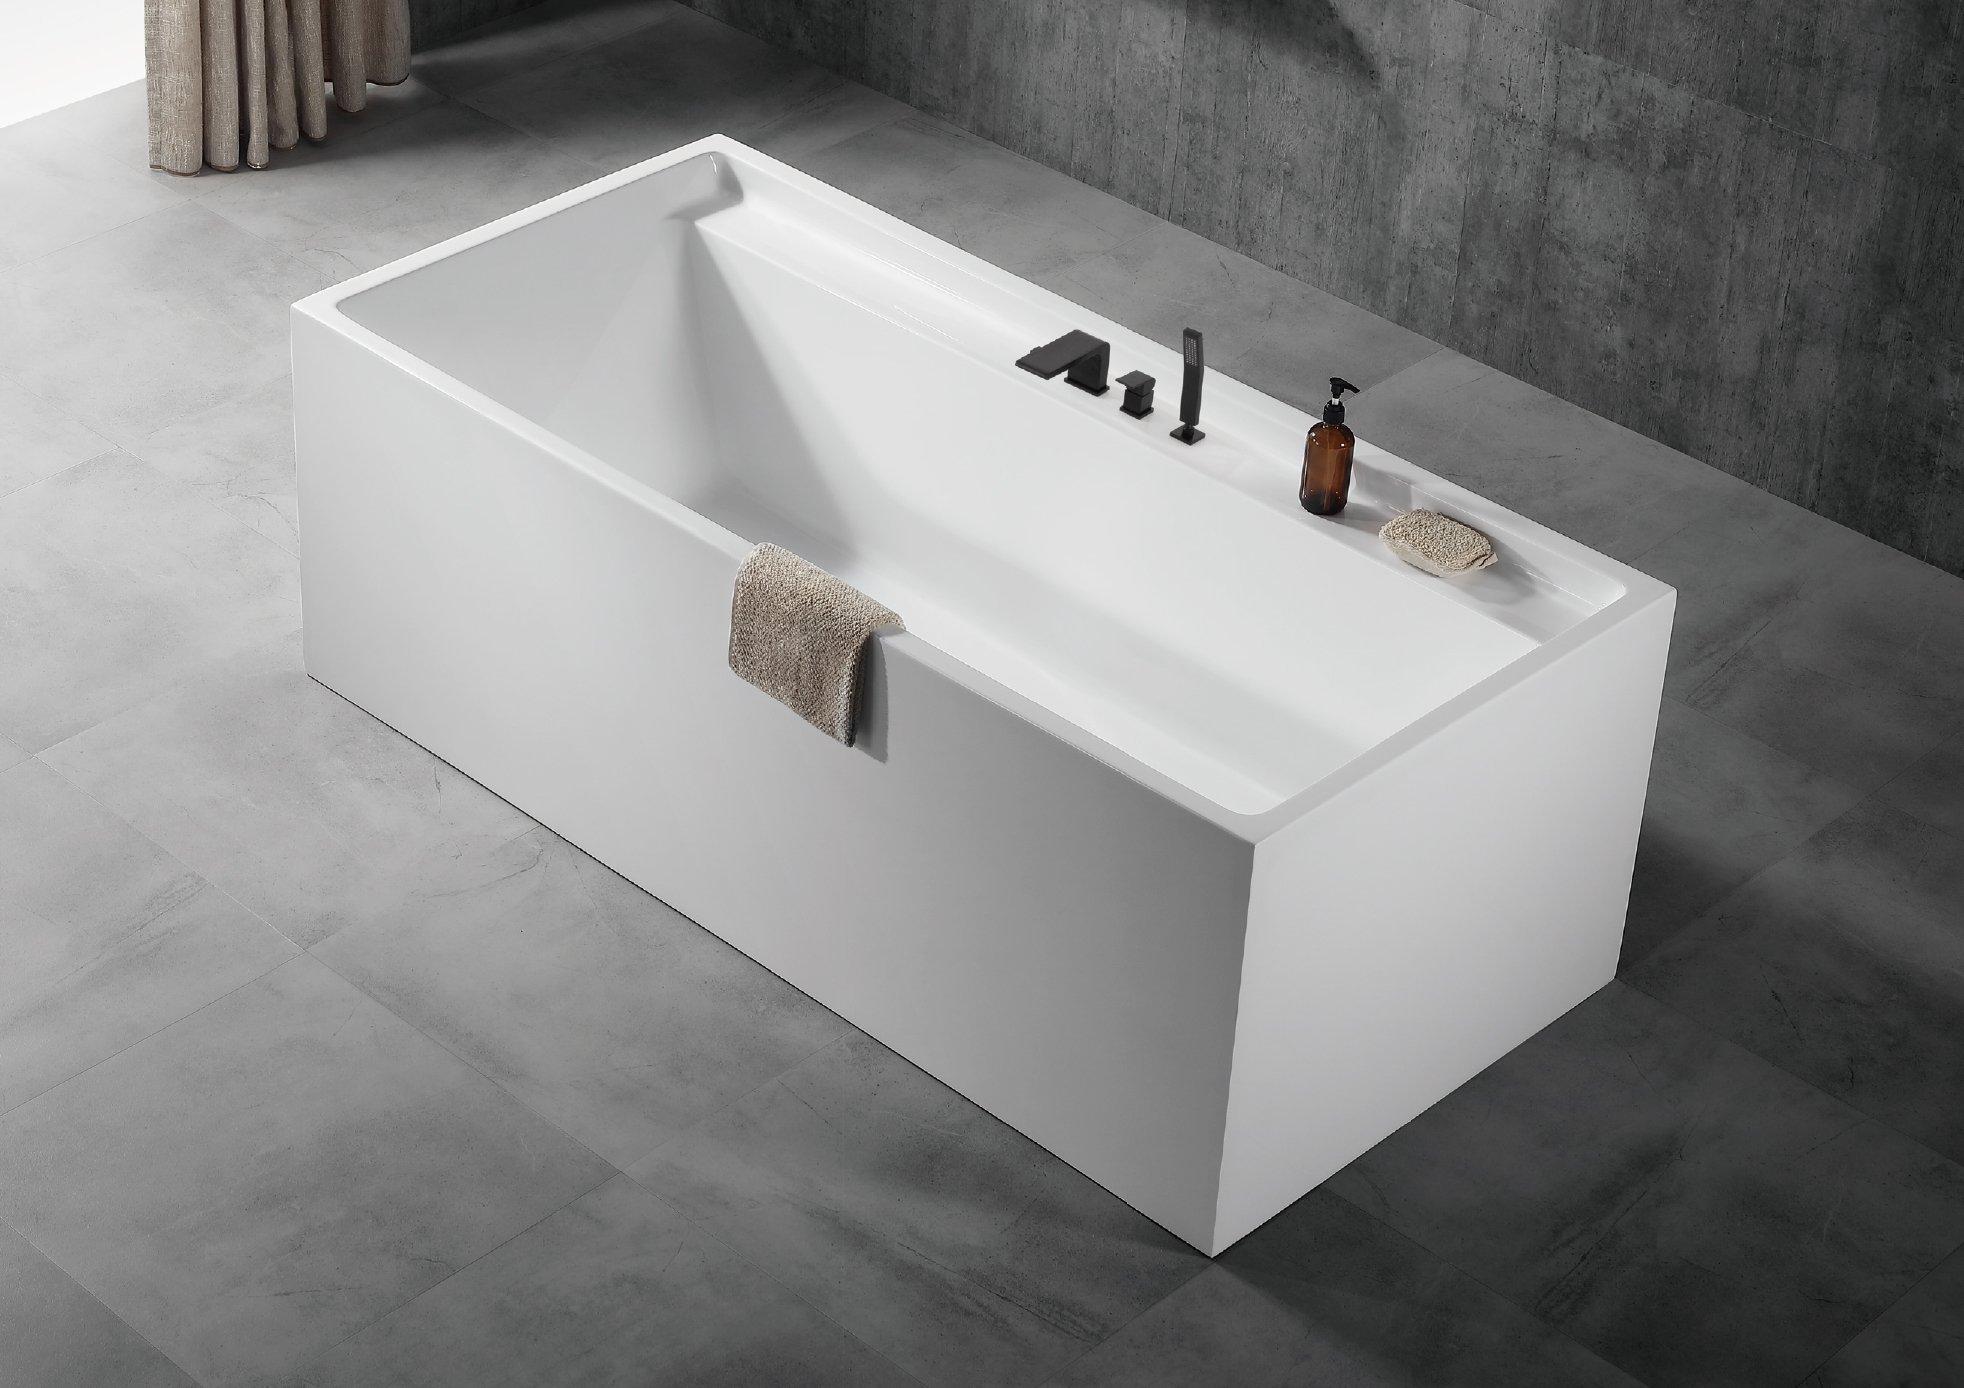 Freistehende Badewanne VERONA Acryl weiß - 170 x 80 x 60 cm - Standarmatur wählbar zoom thumbnail 6